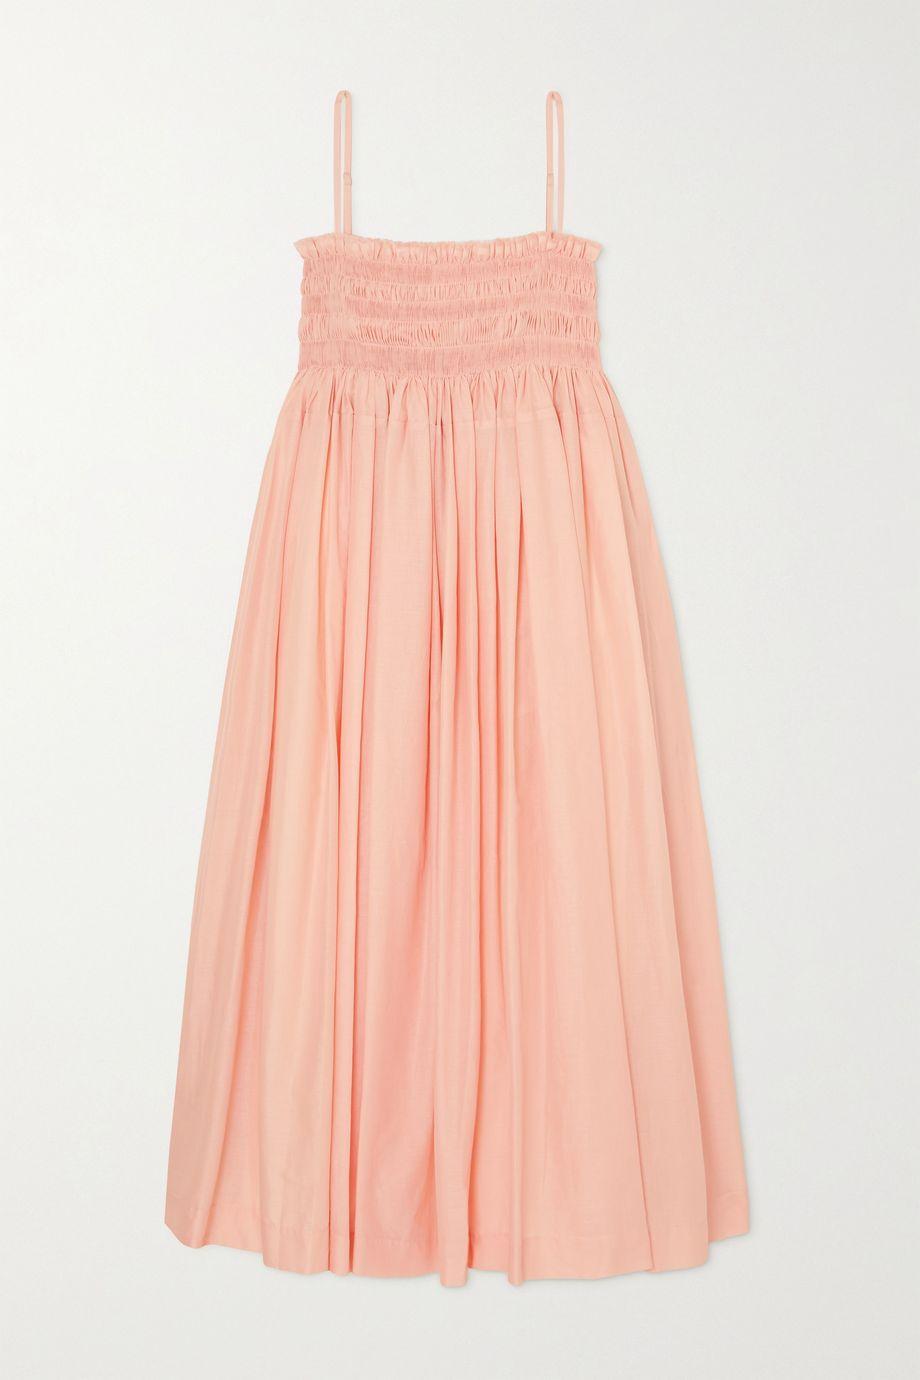 Molly Goddard Becky shirred cotton-voile midi dress